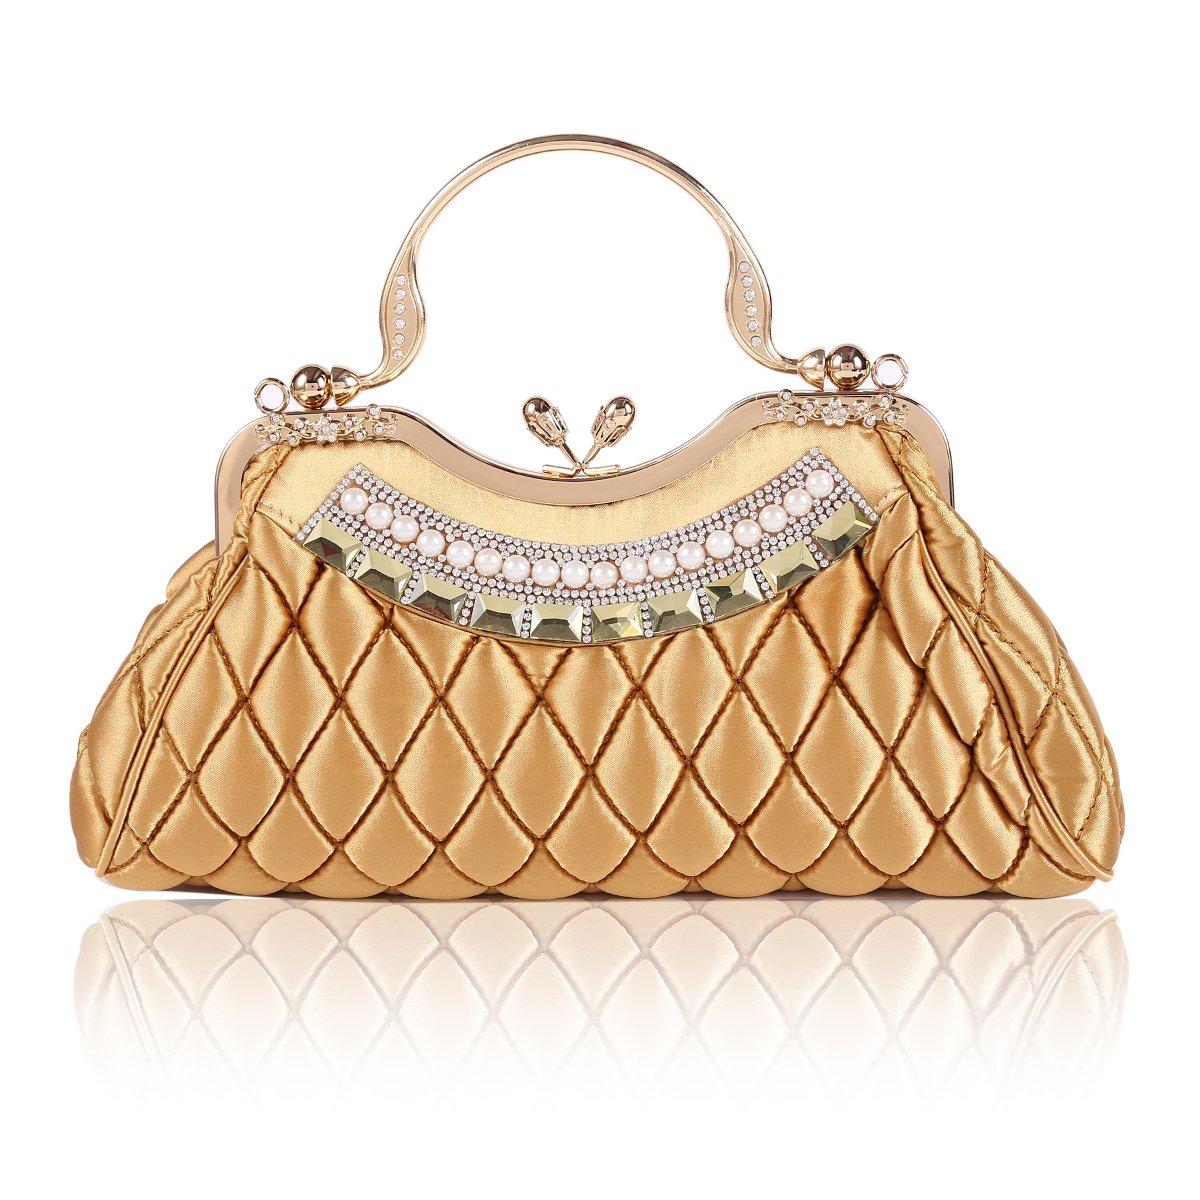 Damara Womens Kiss-lock Handbag Stitching Latticed Evening Bag,Gold